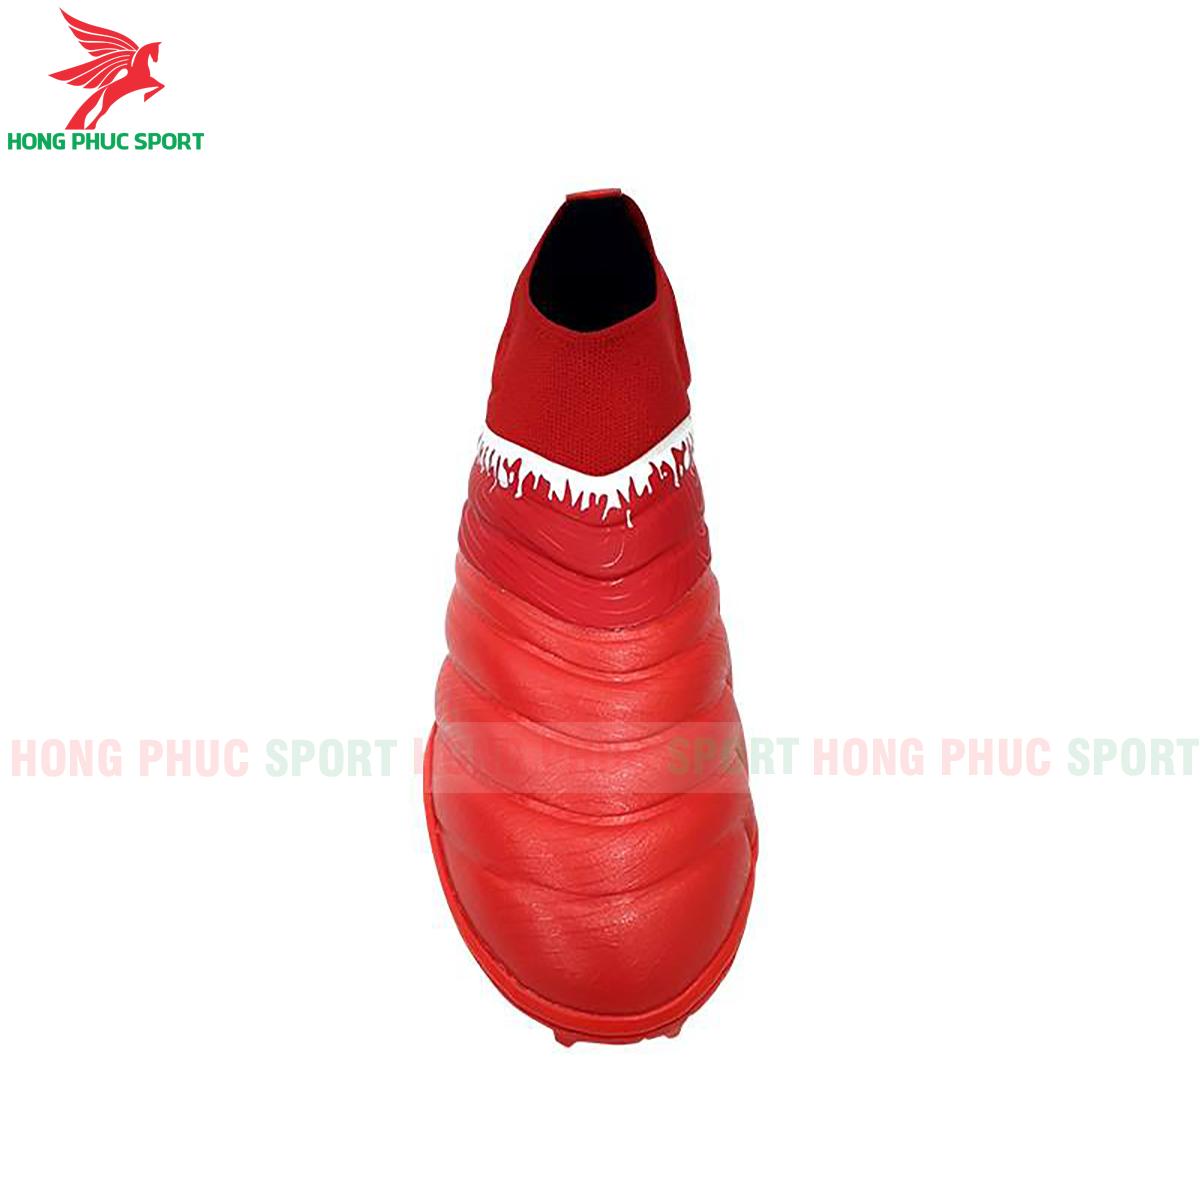 https://cdn.hongphucsport.com/unsafe/s4.shopbay.vn/files/285/giay-da-bong-mira-winner-do-4-5f73fc34e4caf.png